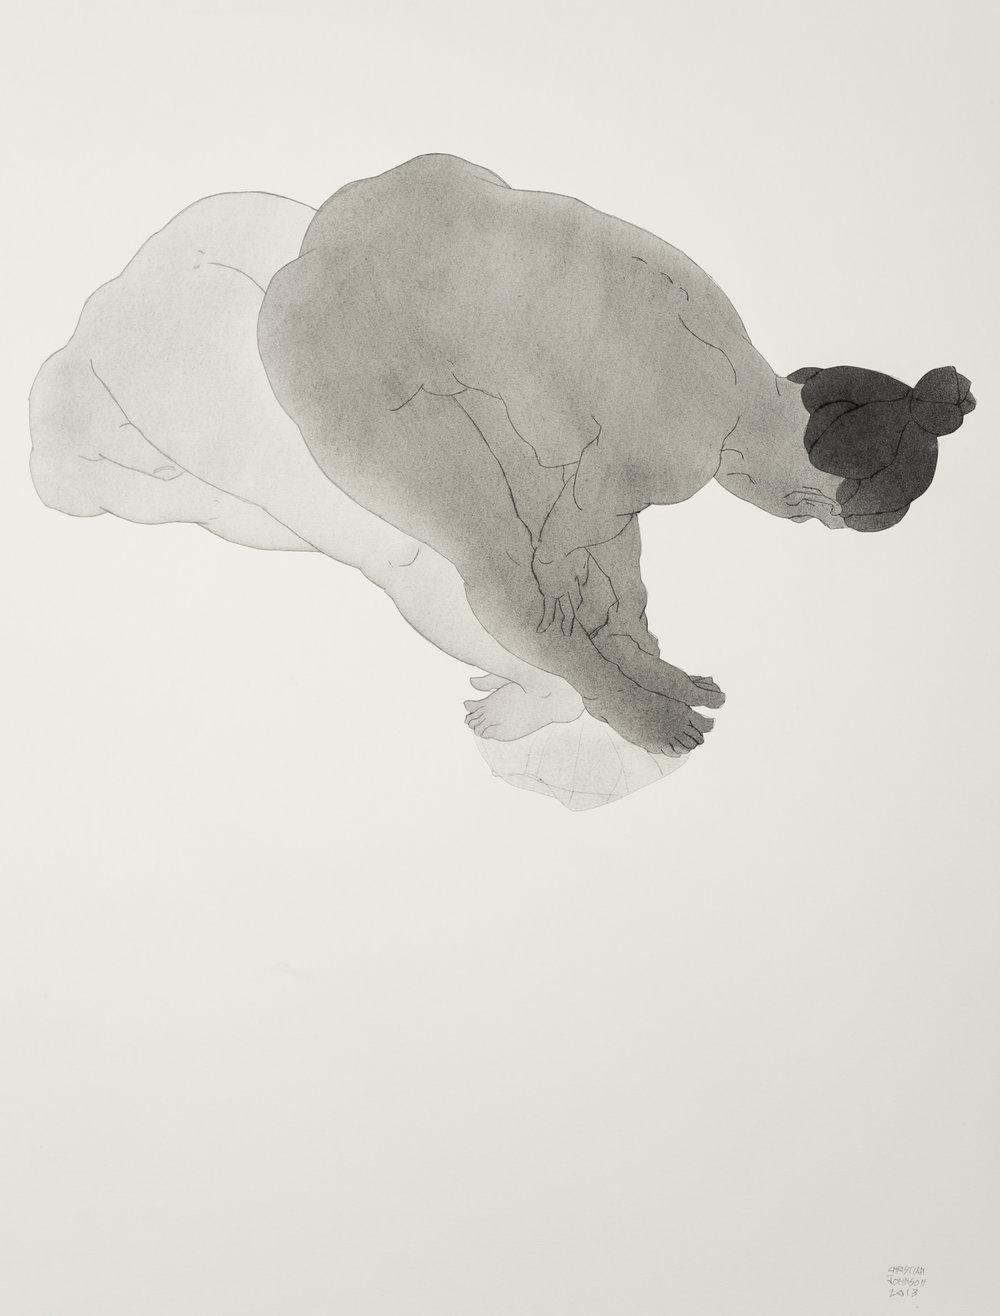 Untitled, 2013. (2013.01.039)